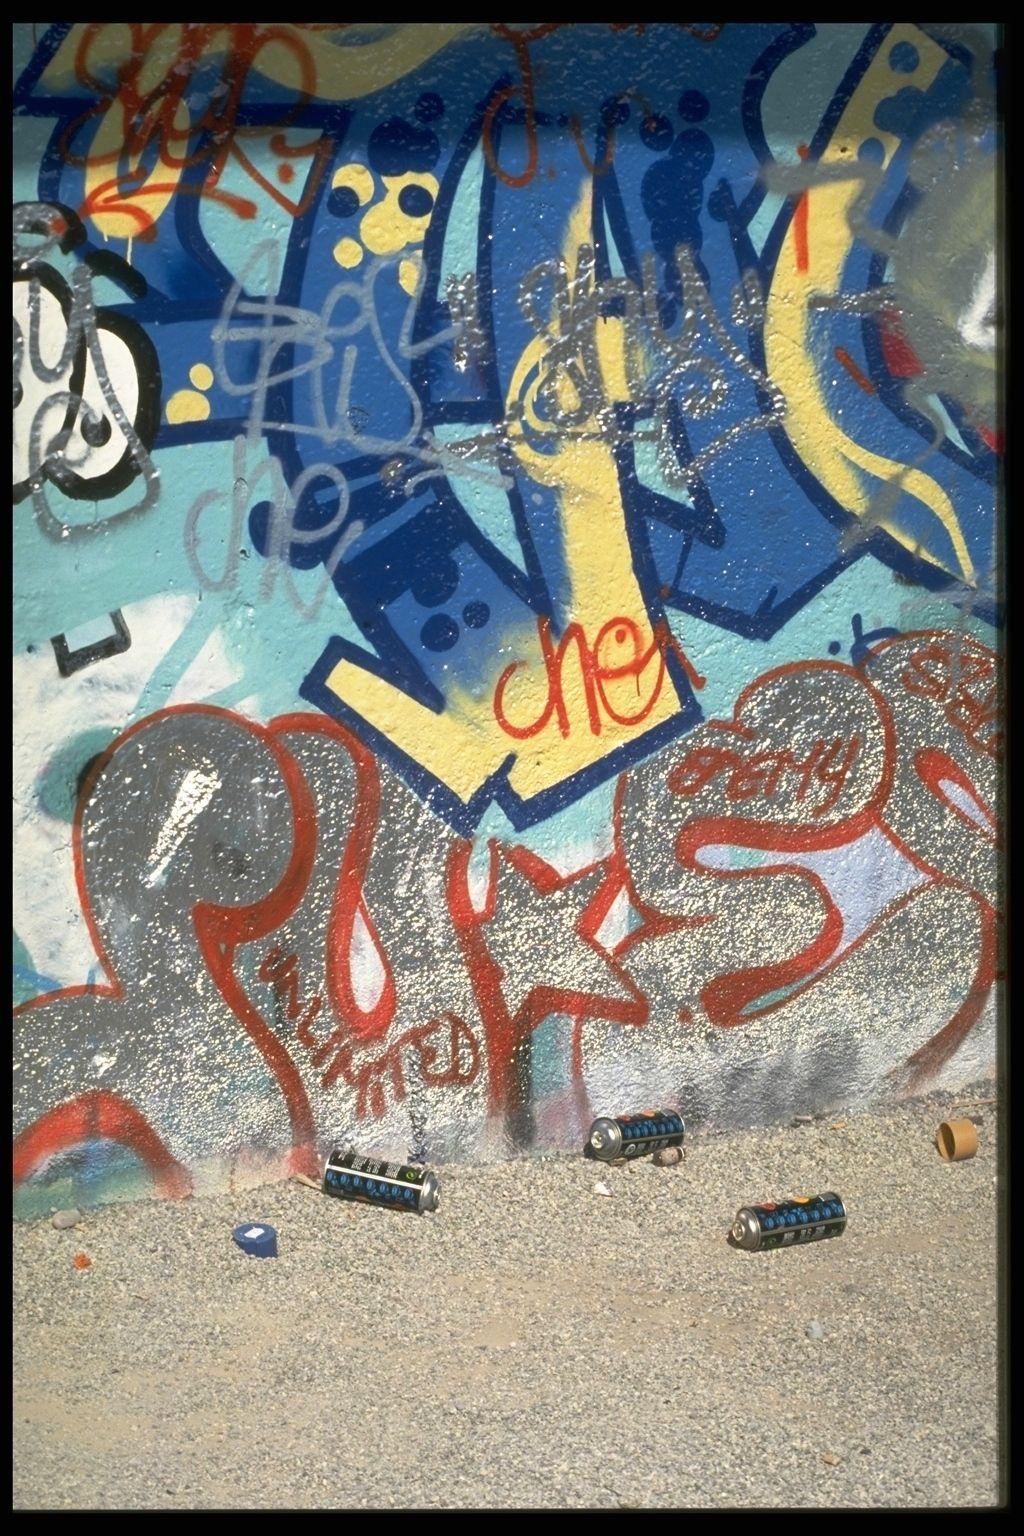 Street graffiti street art urban art city art